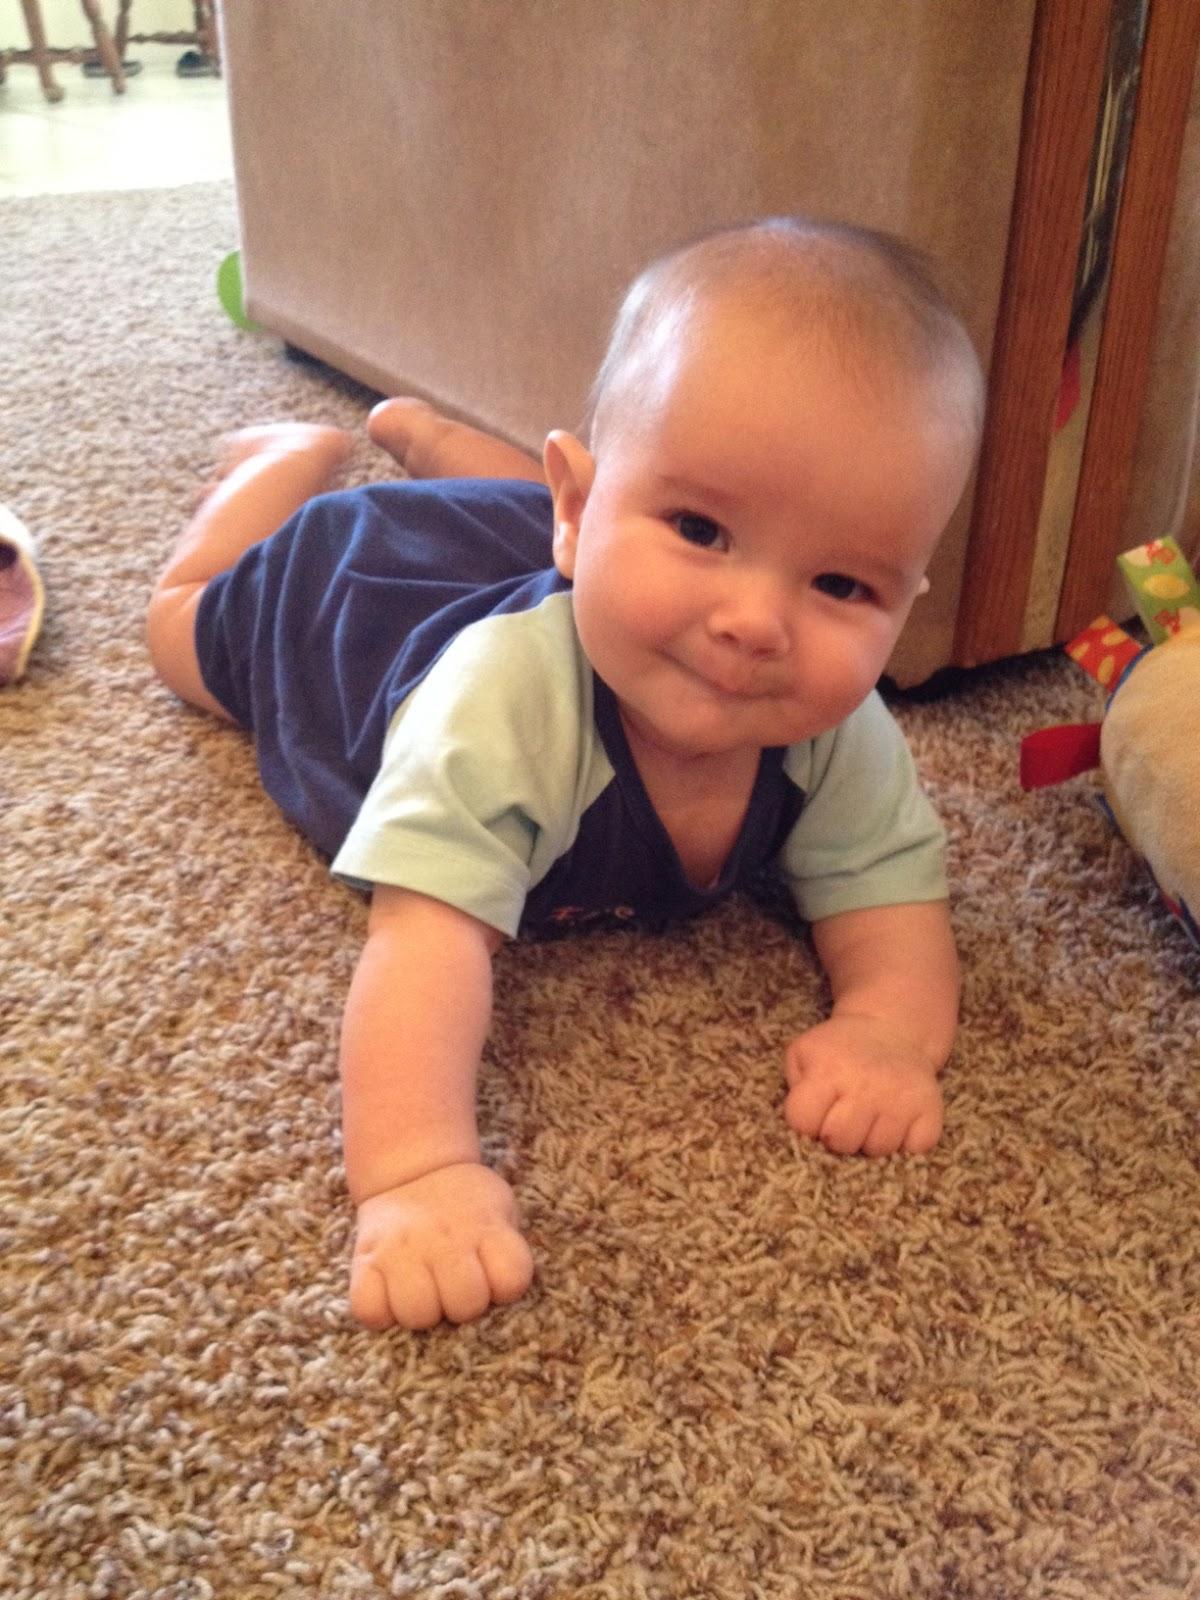 Birth at Home in Arizona: Weird Pregnancy Fantasies!